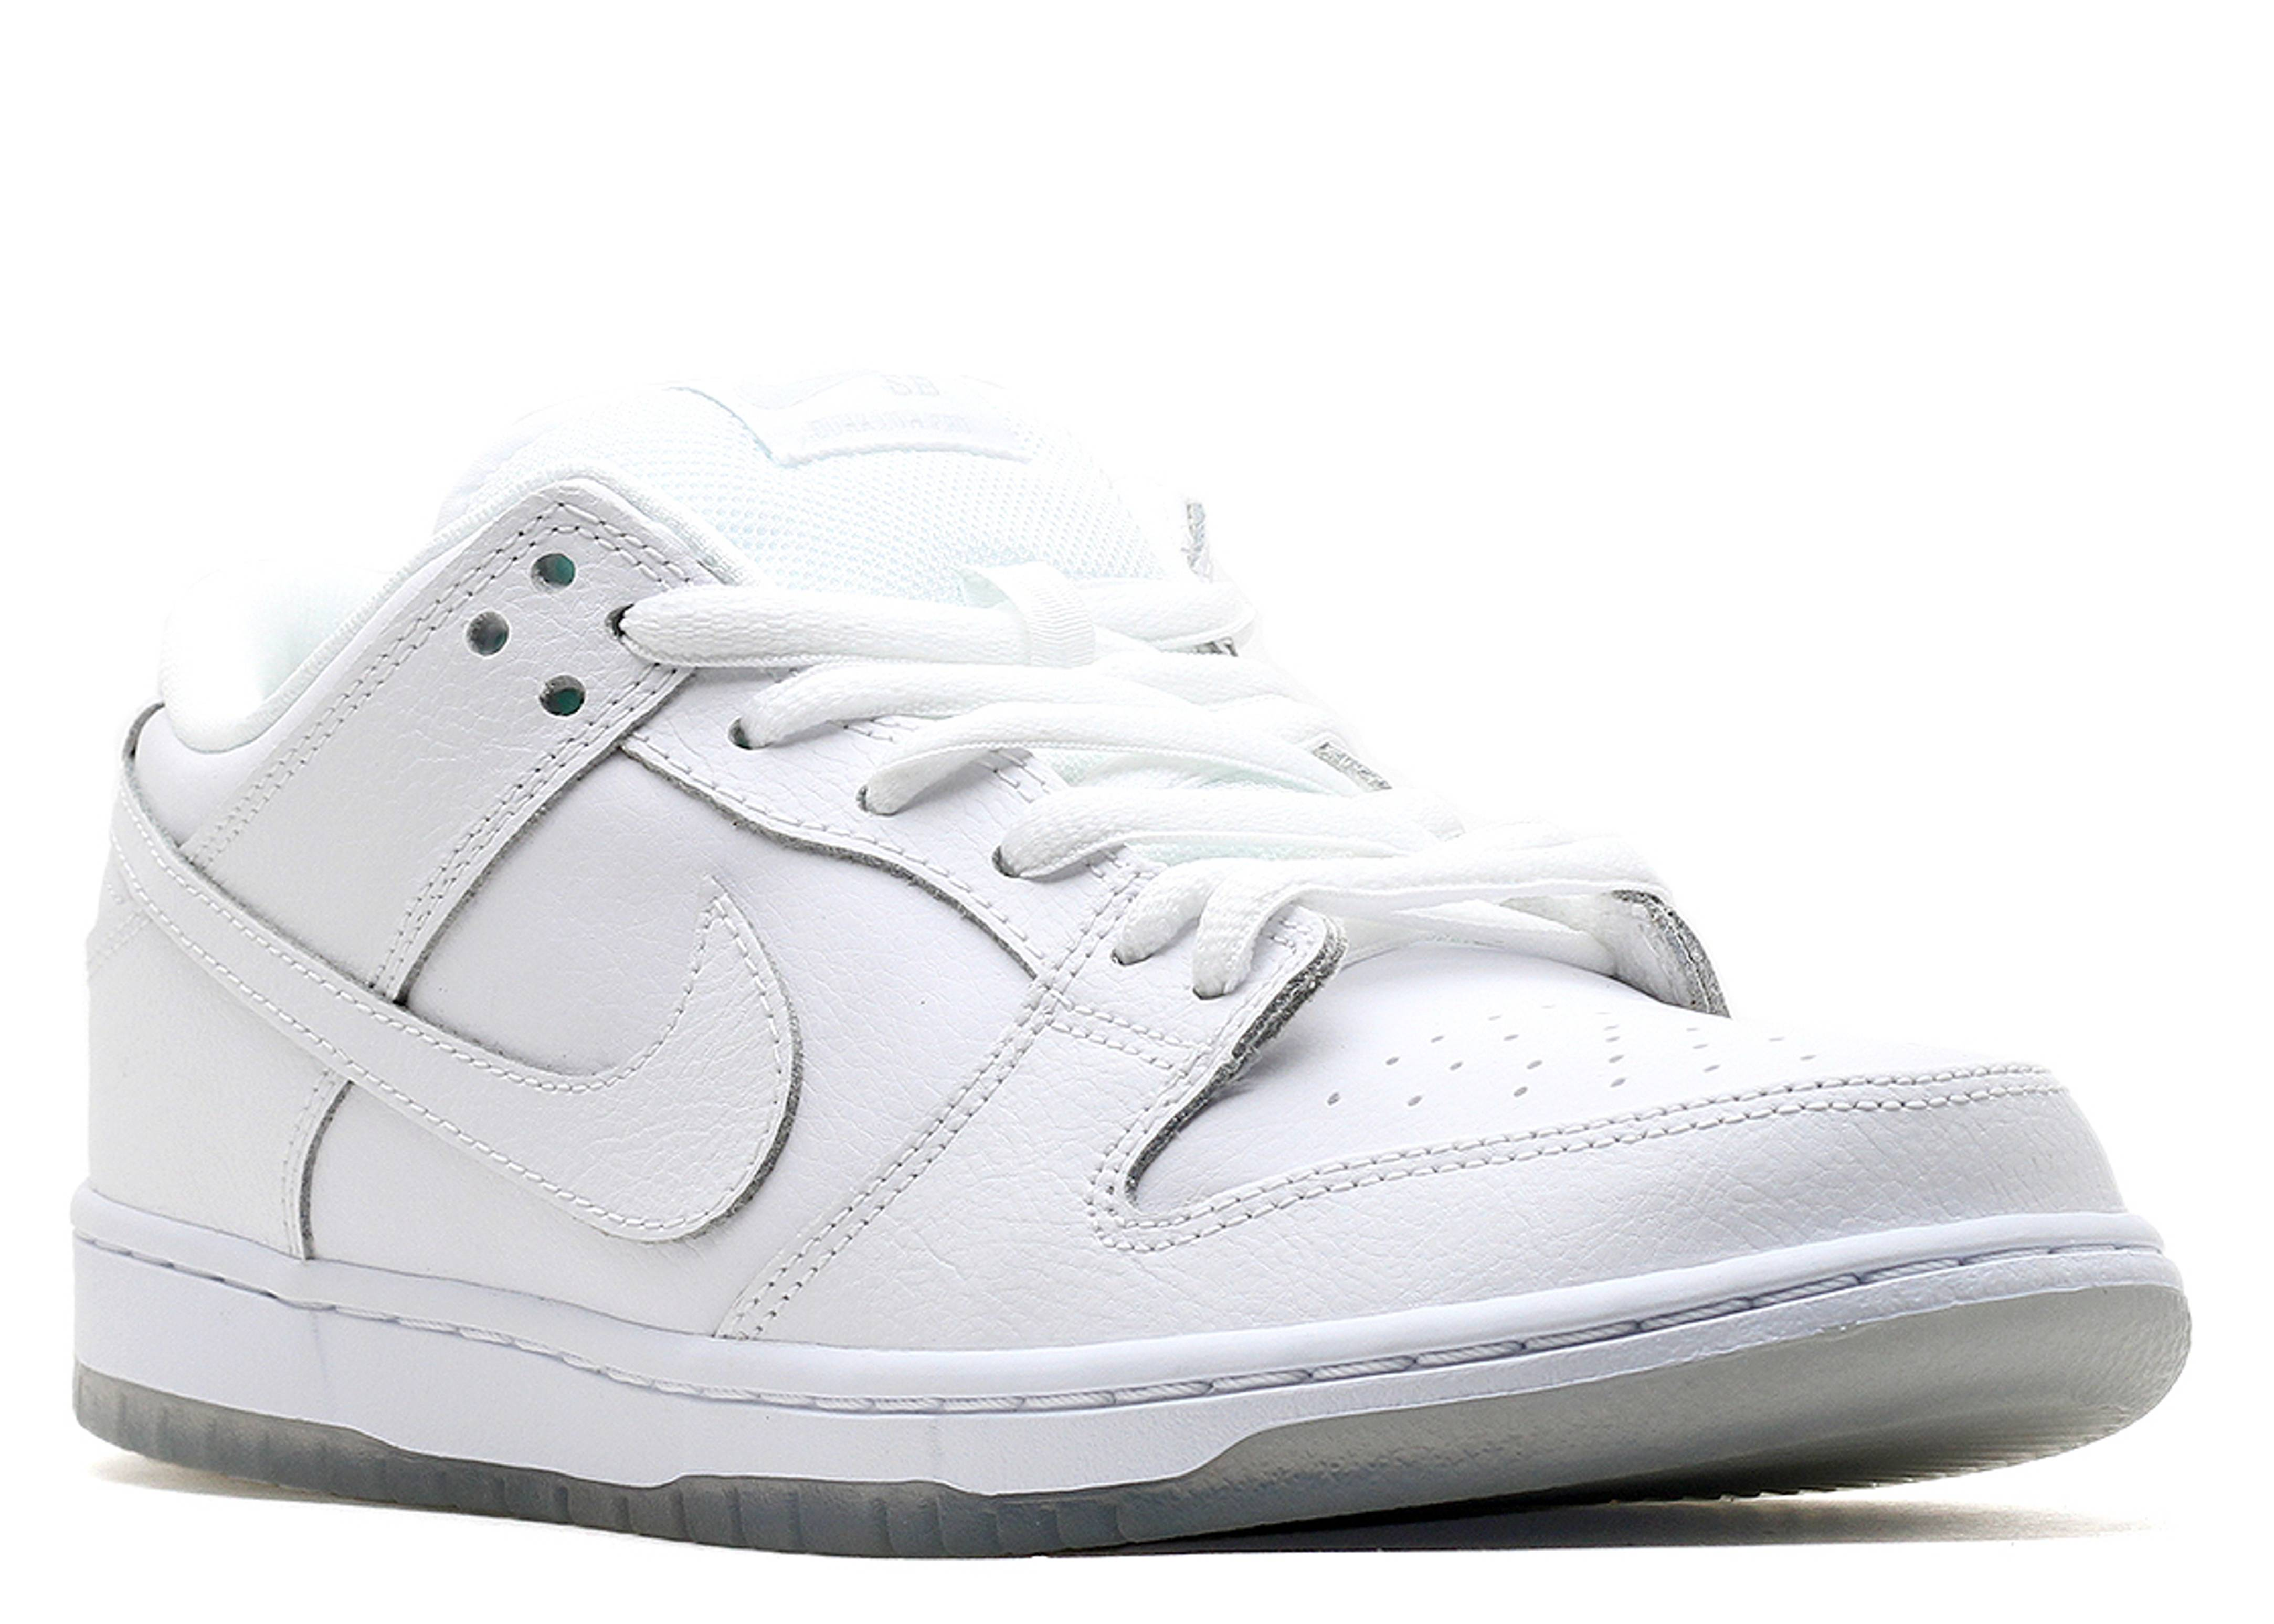 the latest ea6a9 93b48 ... cheap dunk low pro white ice nike 304292 100 white white lt base grey  flight club